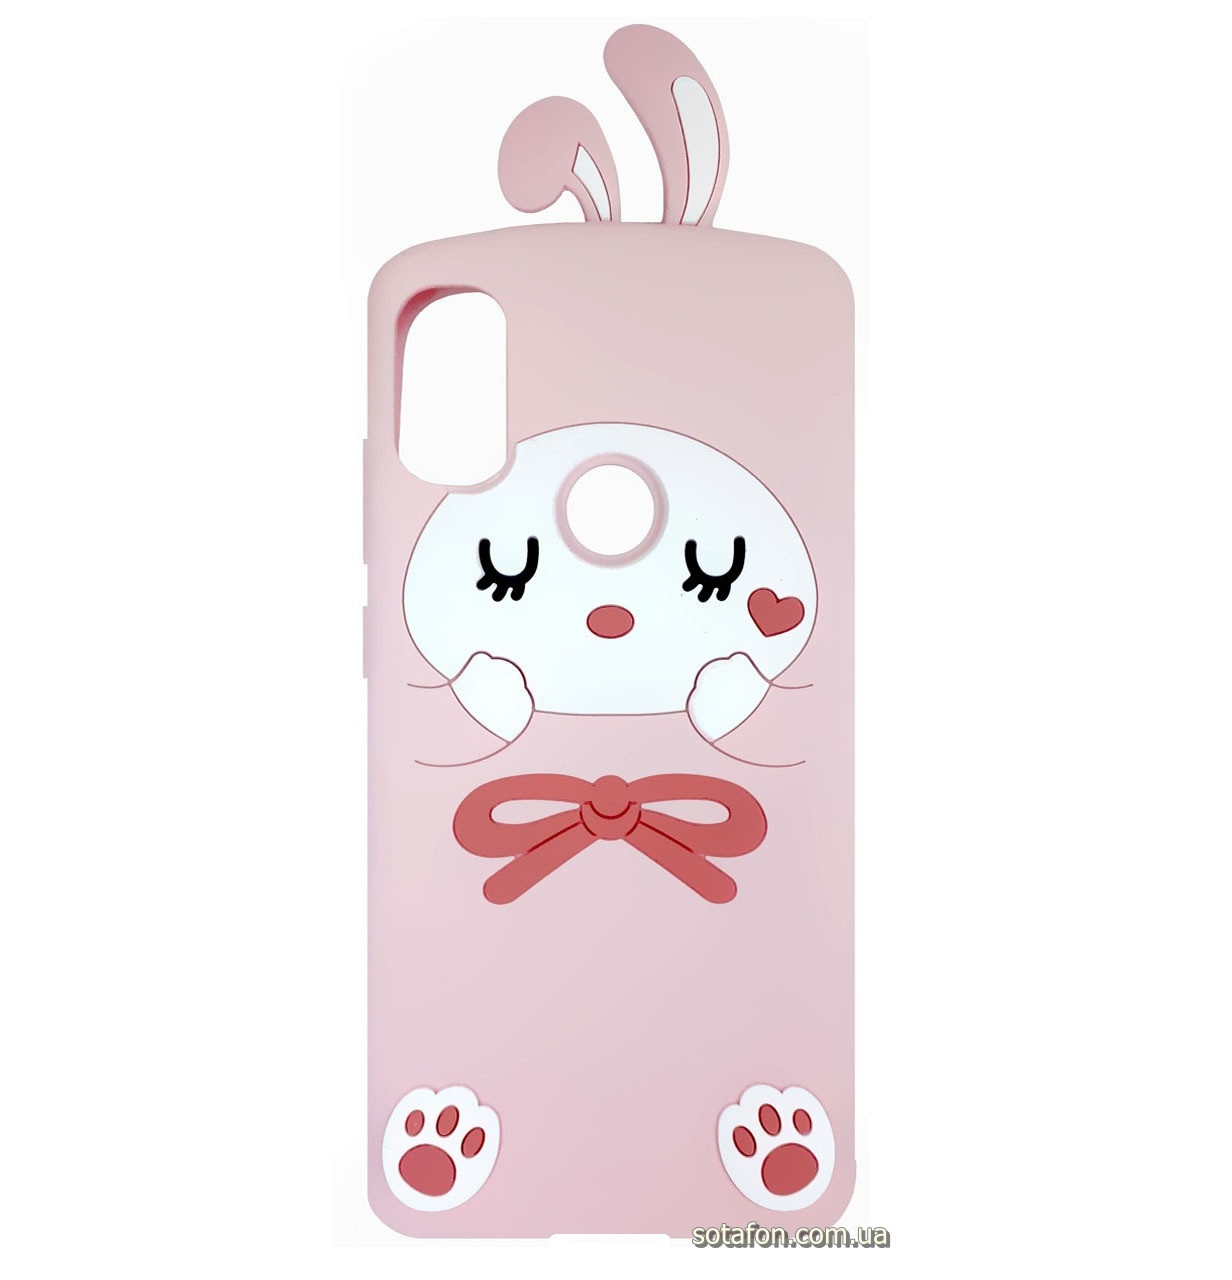 Чехол-накладка TPU Image Bunny для Xiaomi Redmi Note 5 Pro / Note 5 (Al Dual Camera) Pink